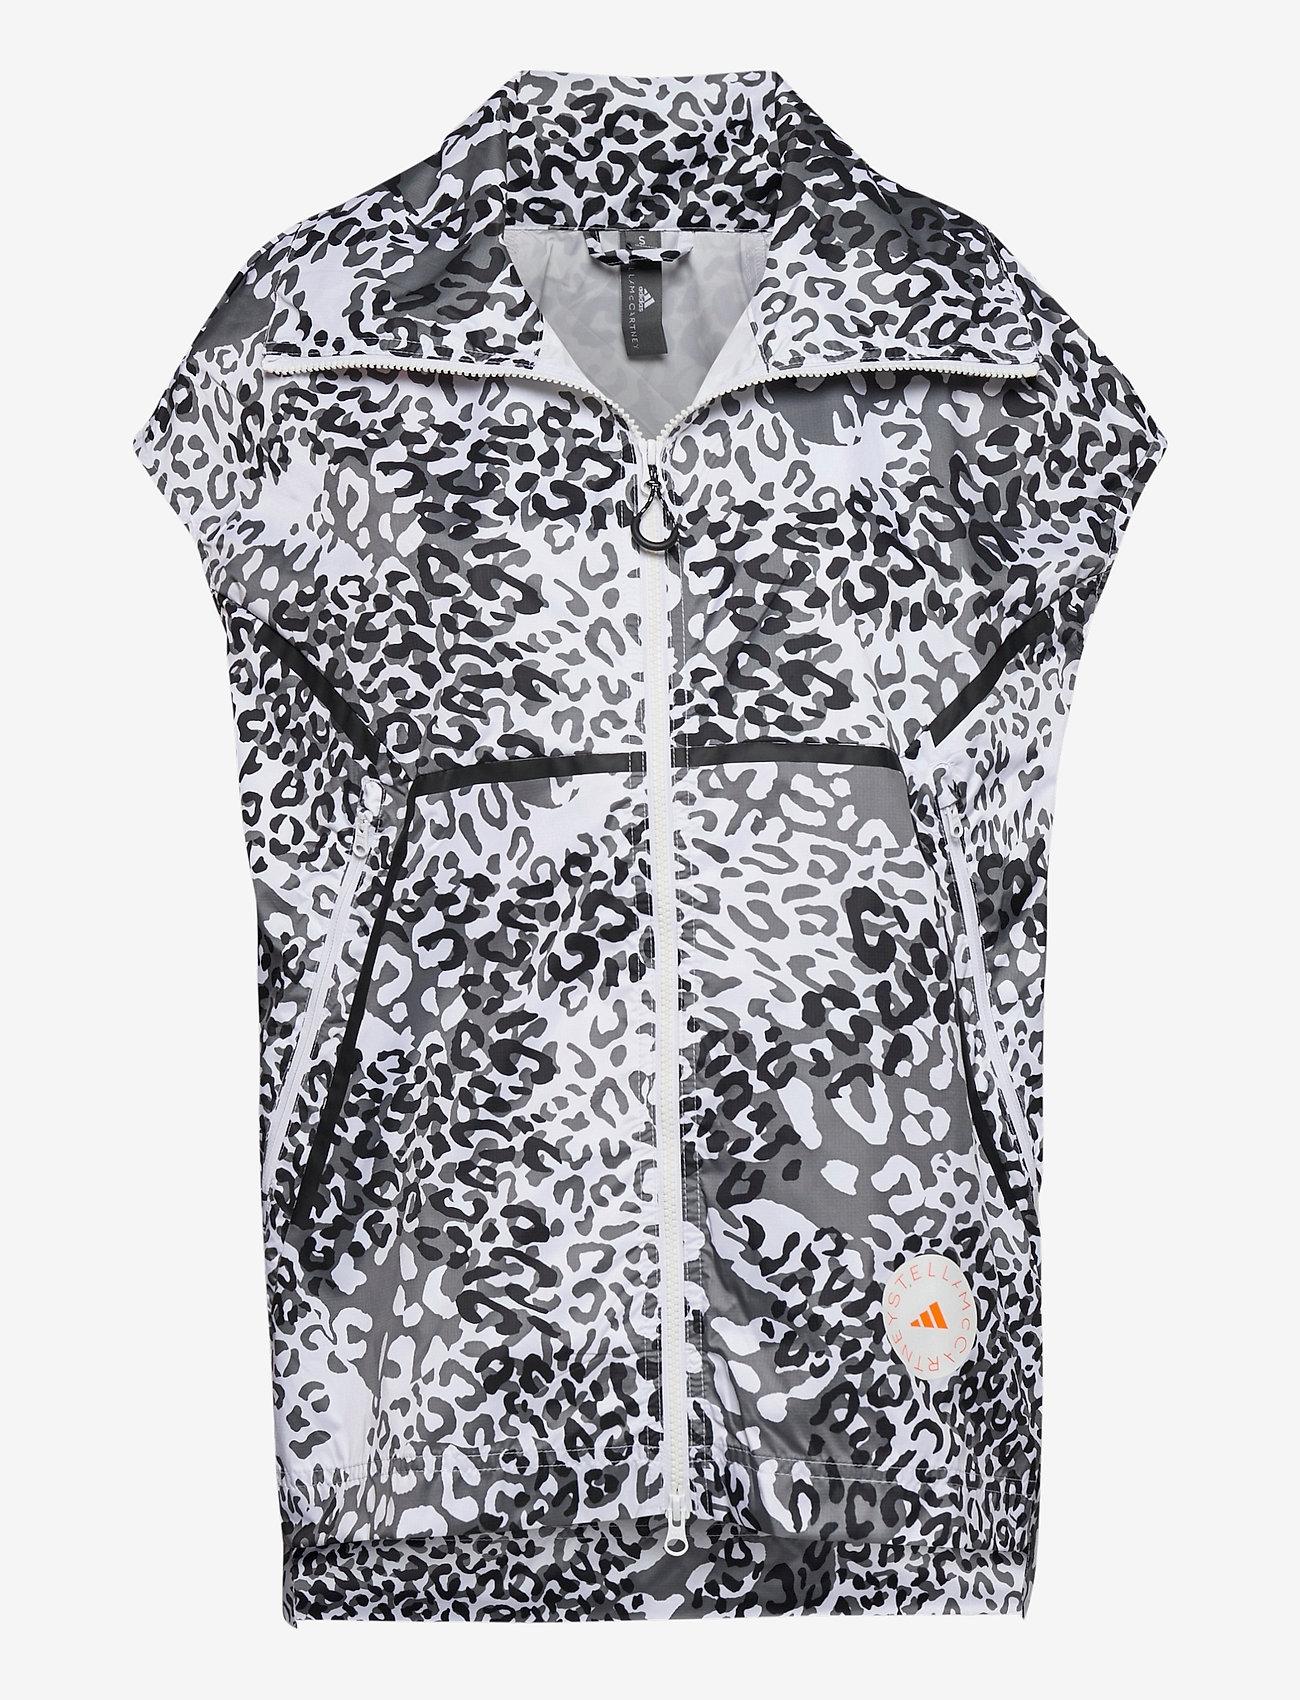 adidas by Stella McCartney - TRUEPACE GILET - gevoerde vesten - white/black/ash - 1